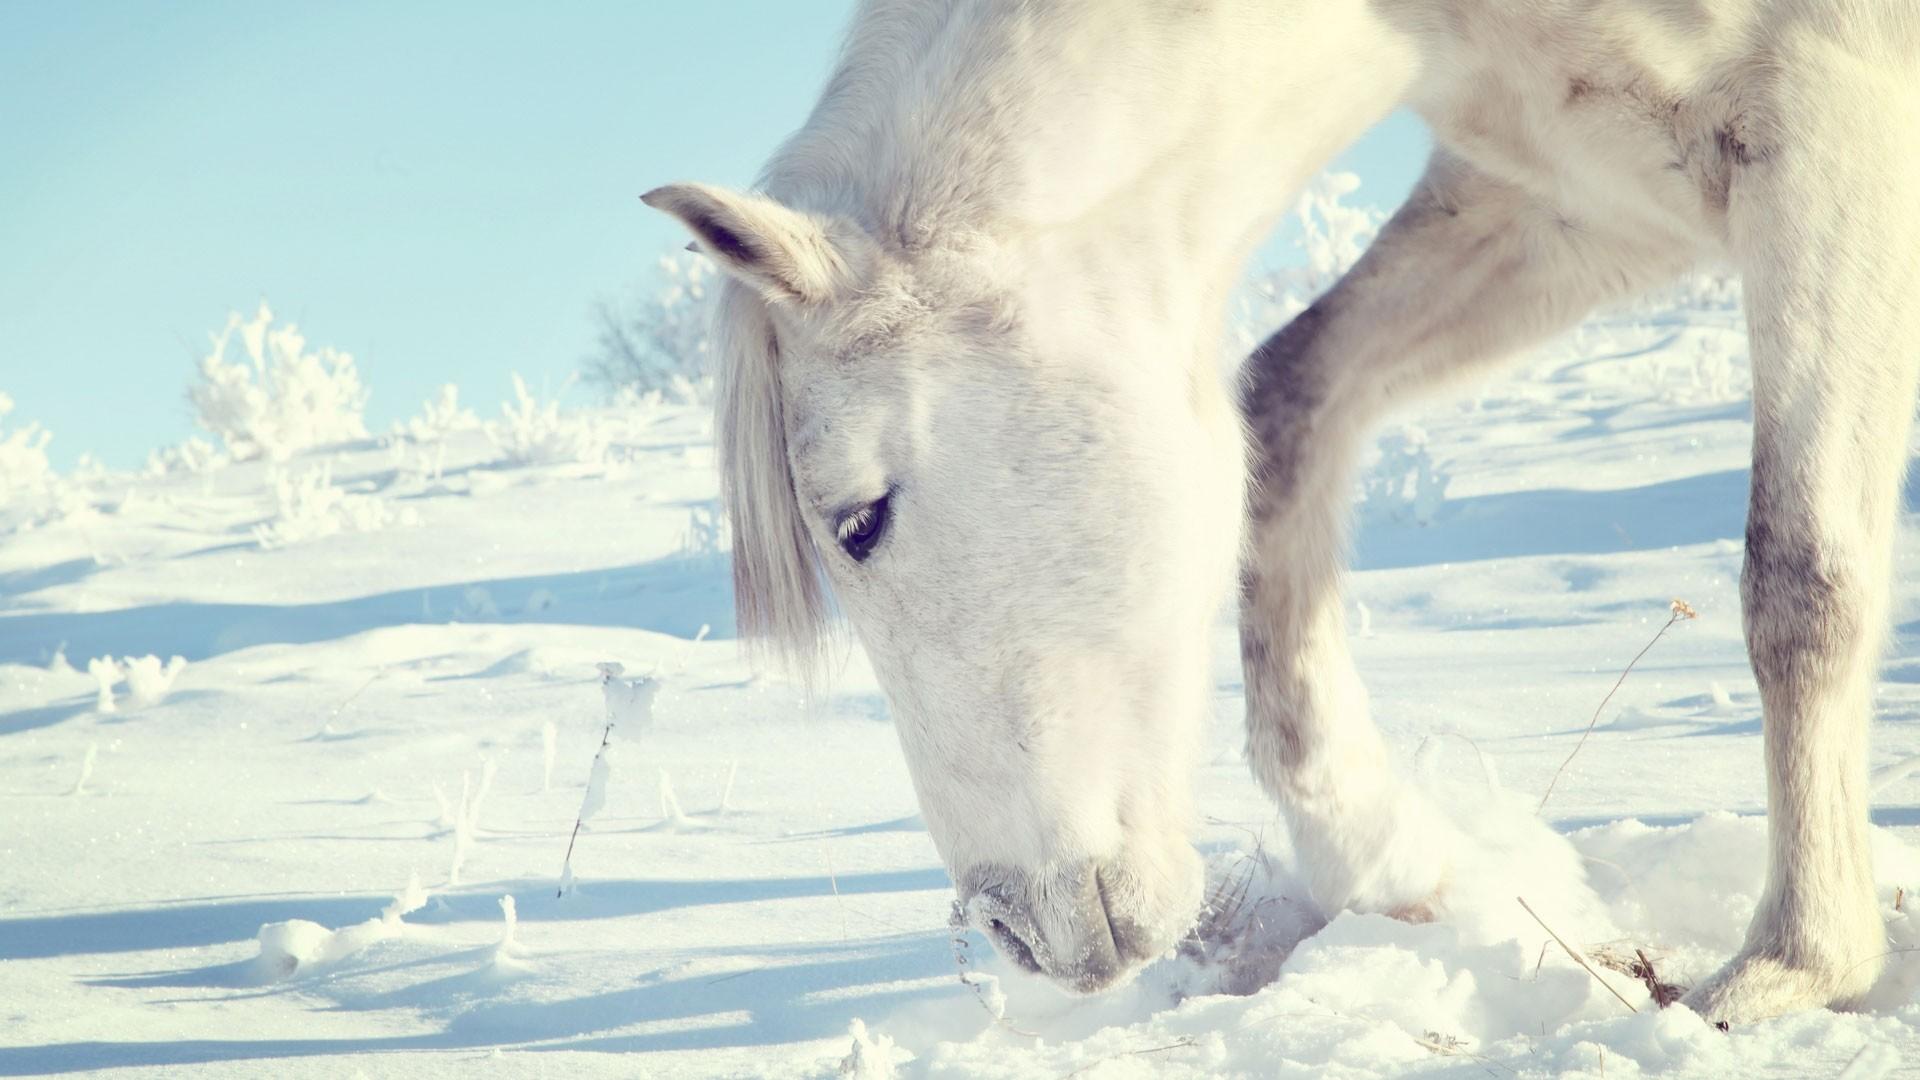 Preview wallpaper horse, snow, shrubs, winter, head 1920×1080